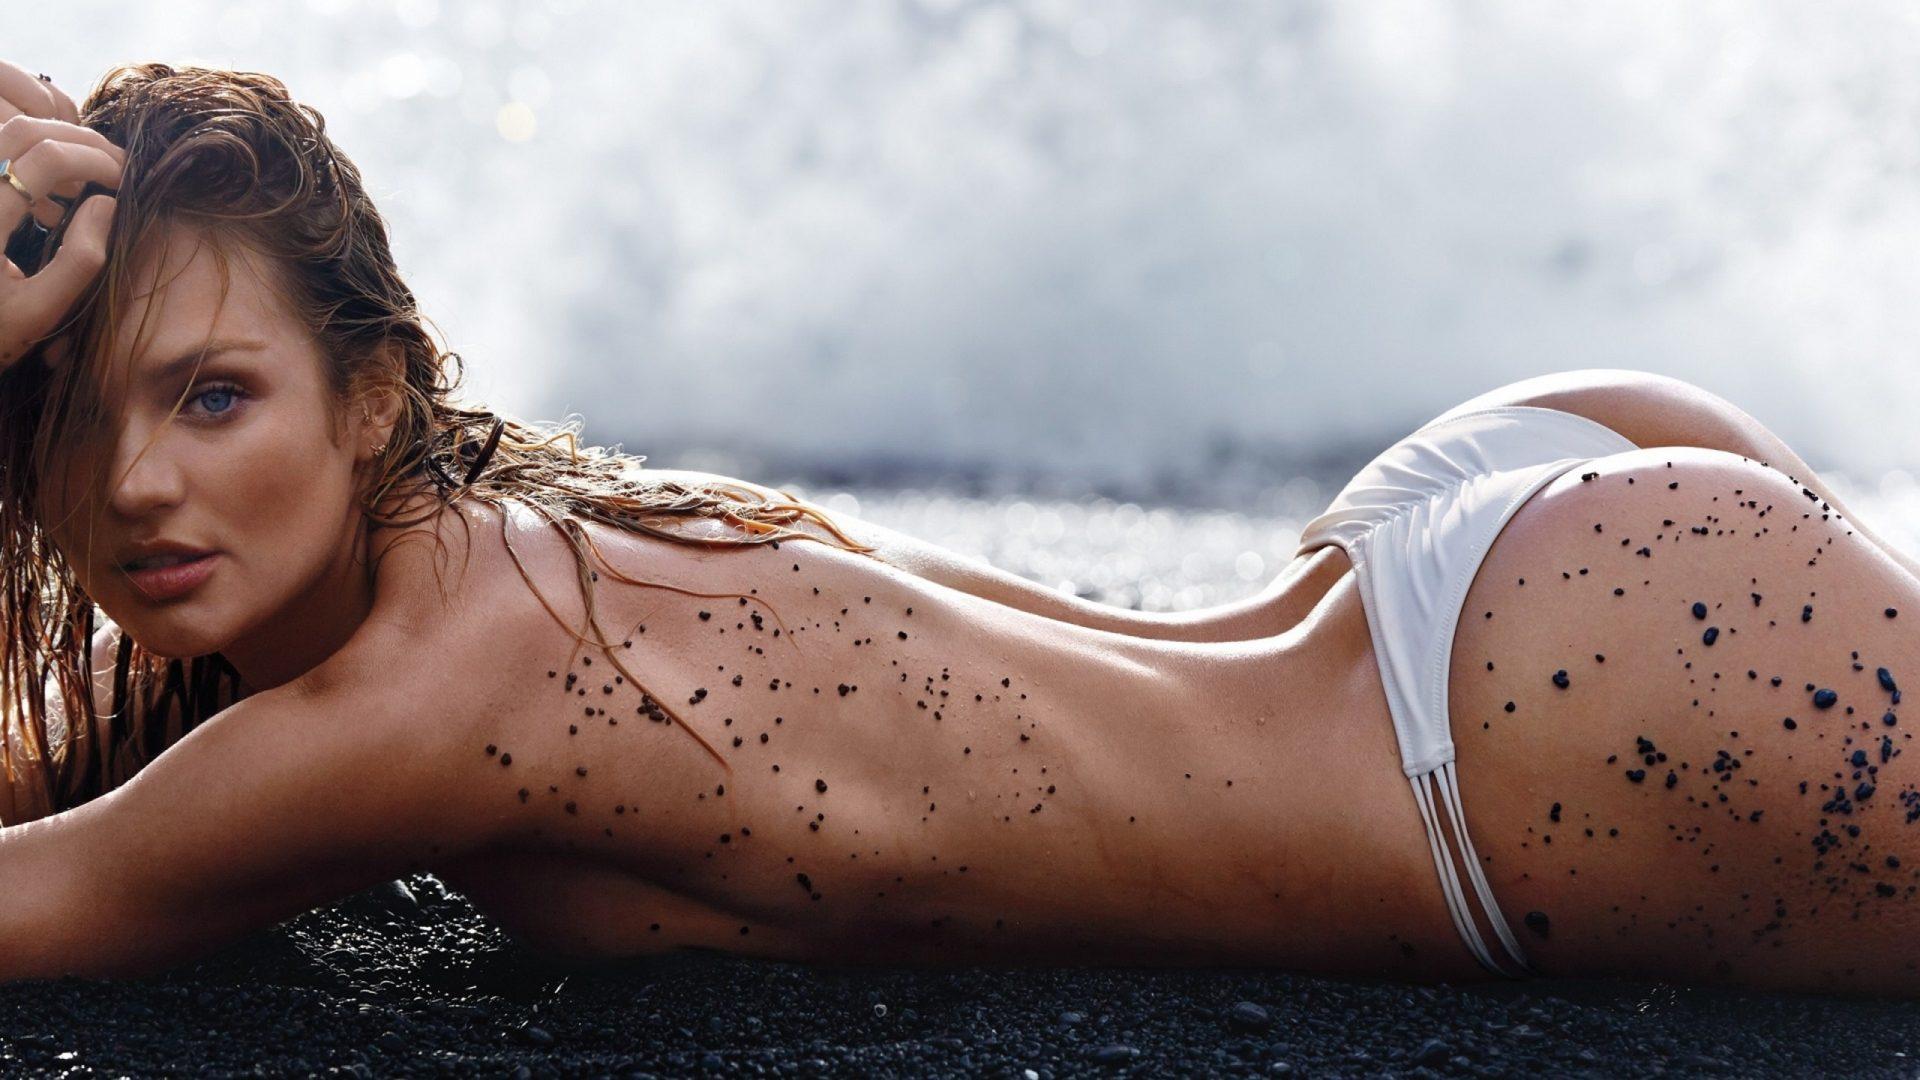 women-model-long-hair-celebrity-Candice-Swanepoel-lingerie